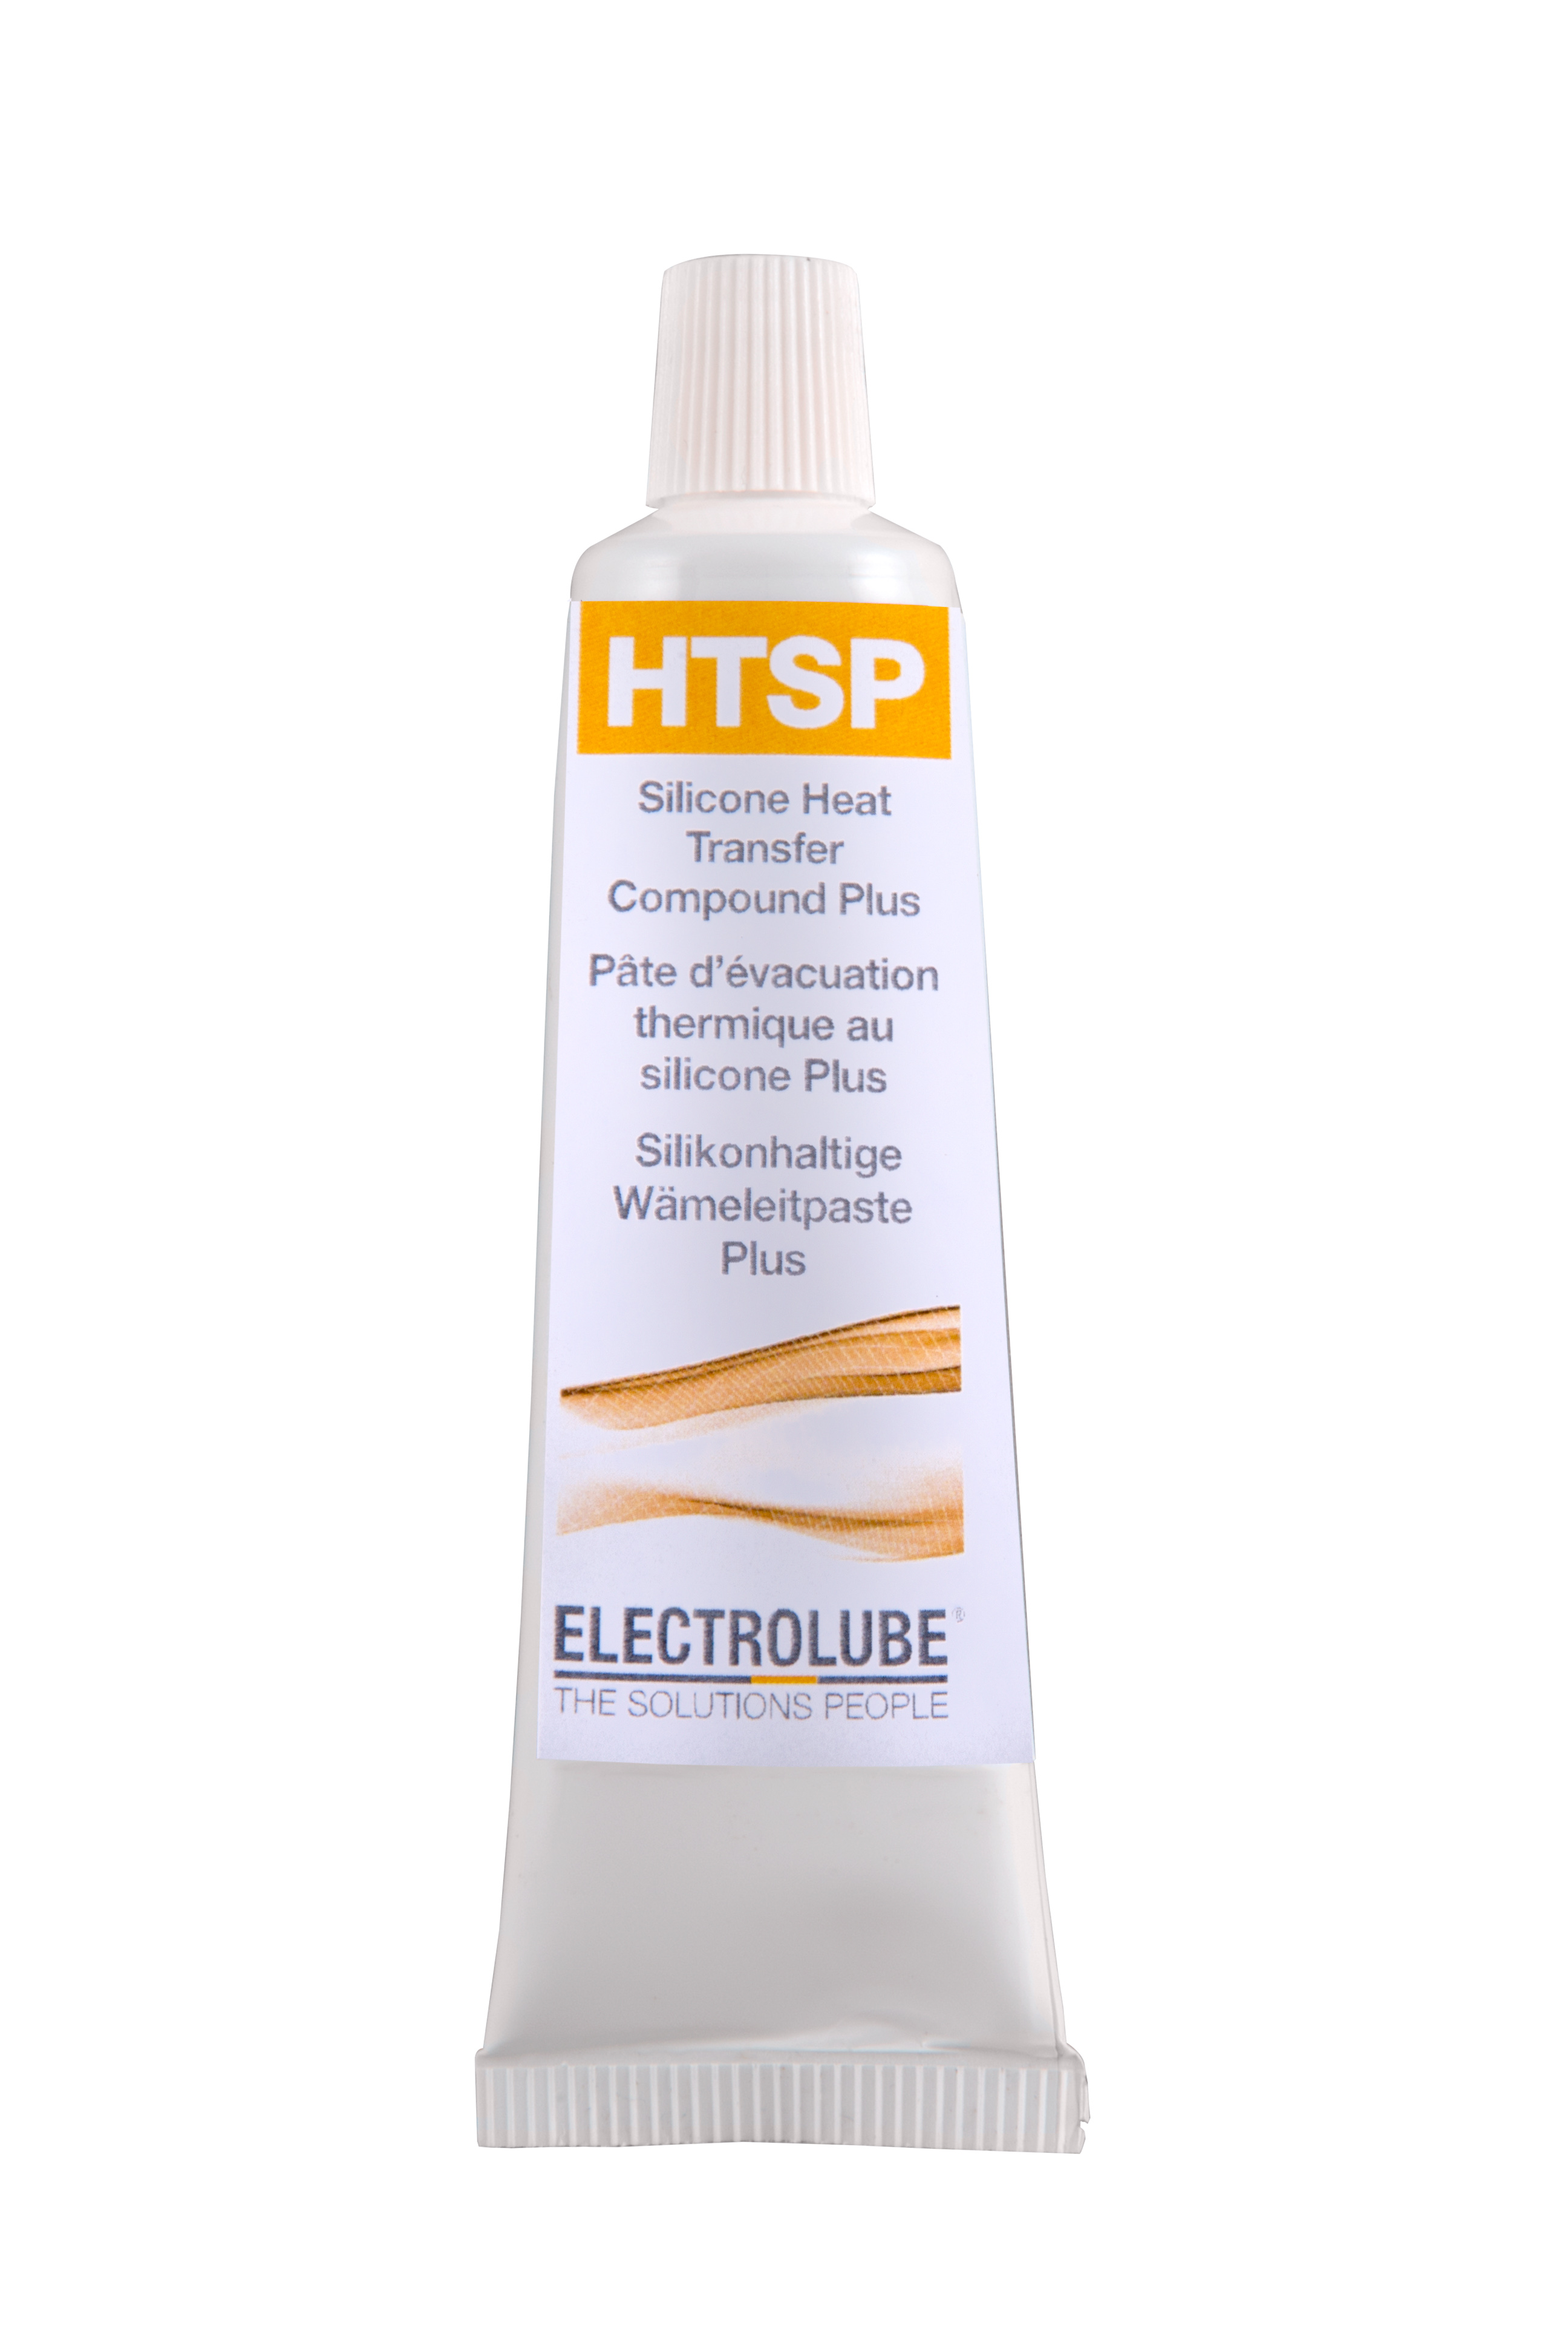 HTSP50T Electrolube | HTSP50T купить на Symmetron.ru, спецификации, схемы HTSP50T Electrolube